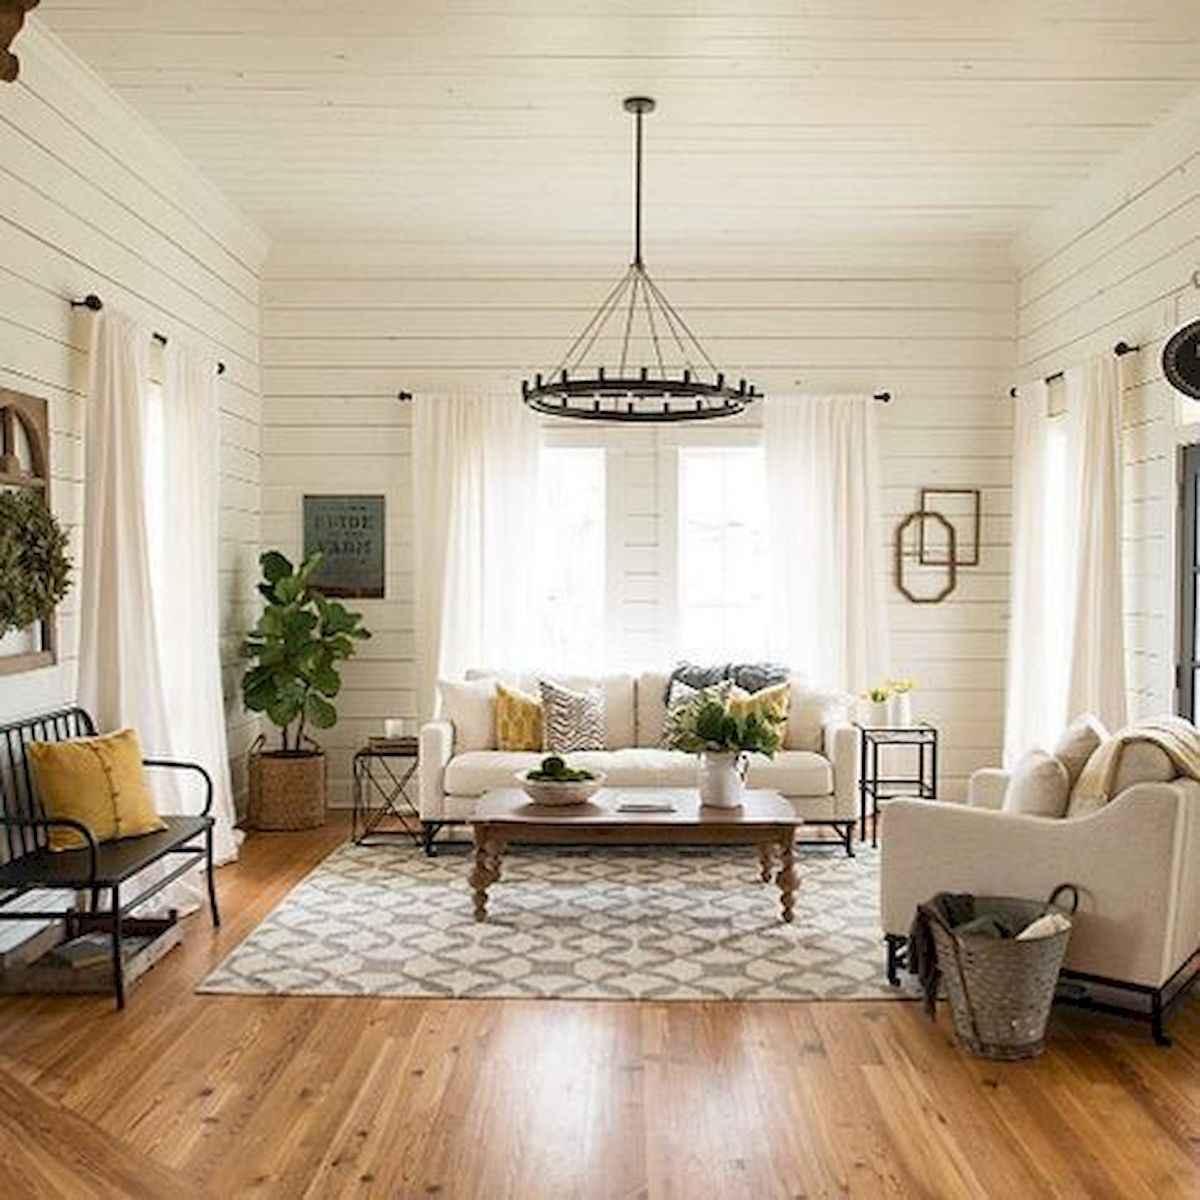 30 Stunning Farmhouse Living Room Decor Ideas (8)